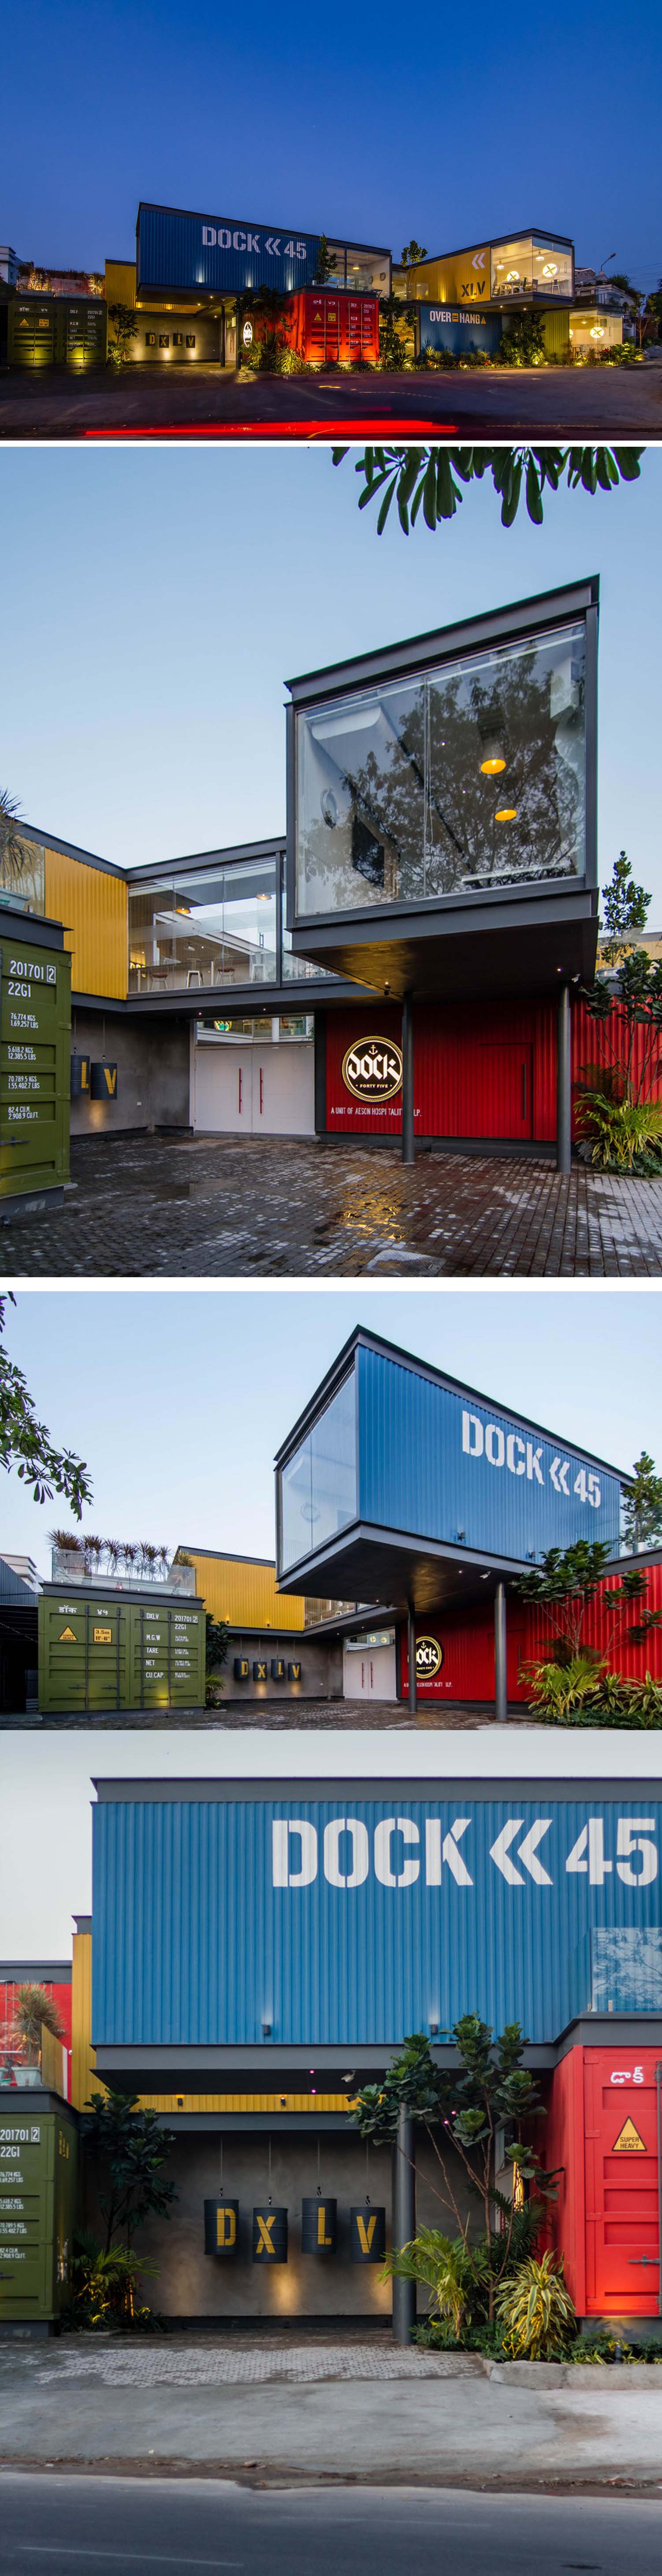 Container Restaurant Dock 45 Spacefiction studio The